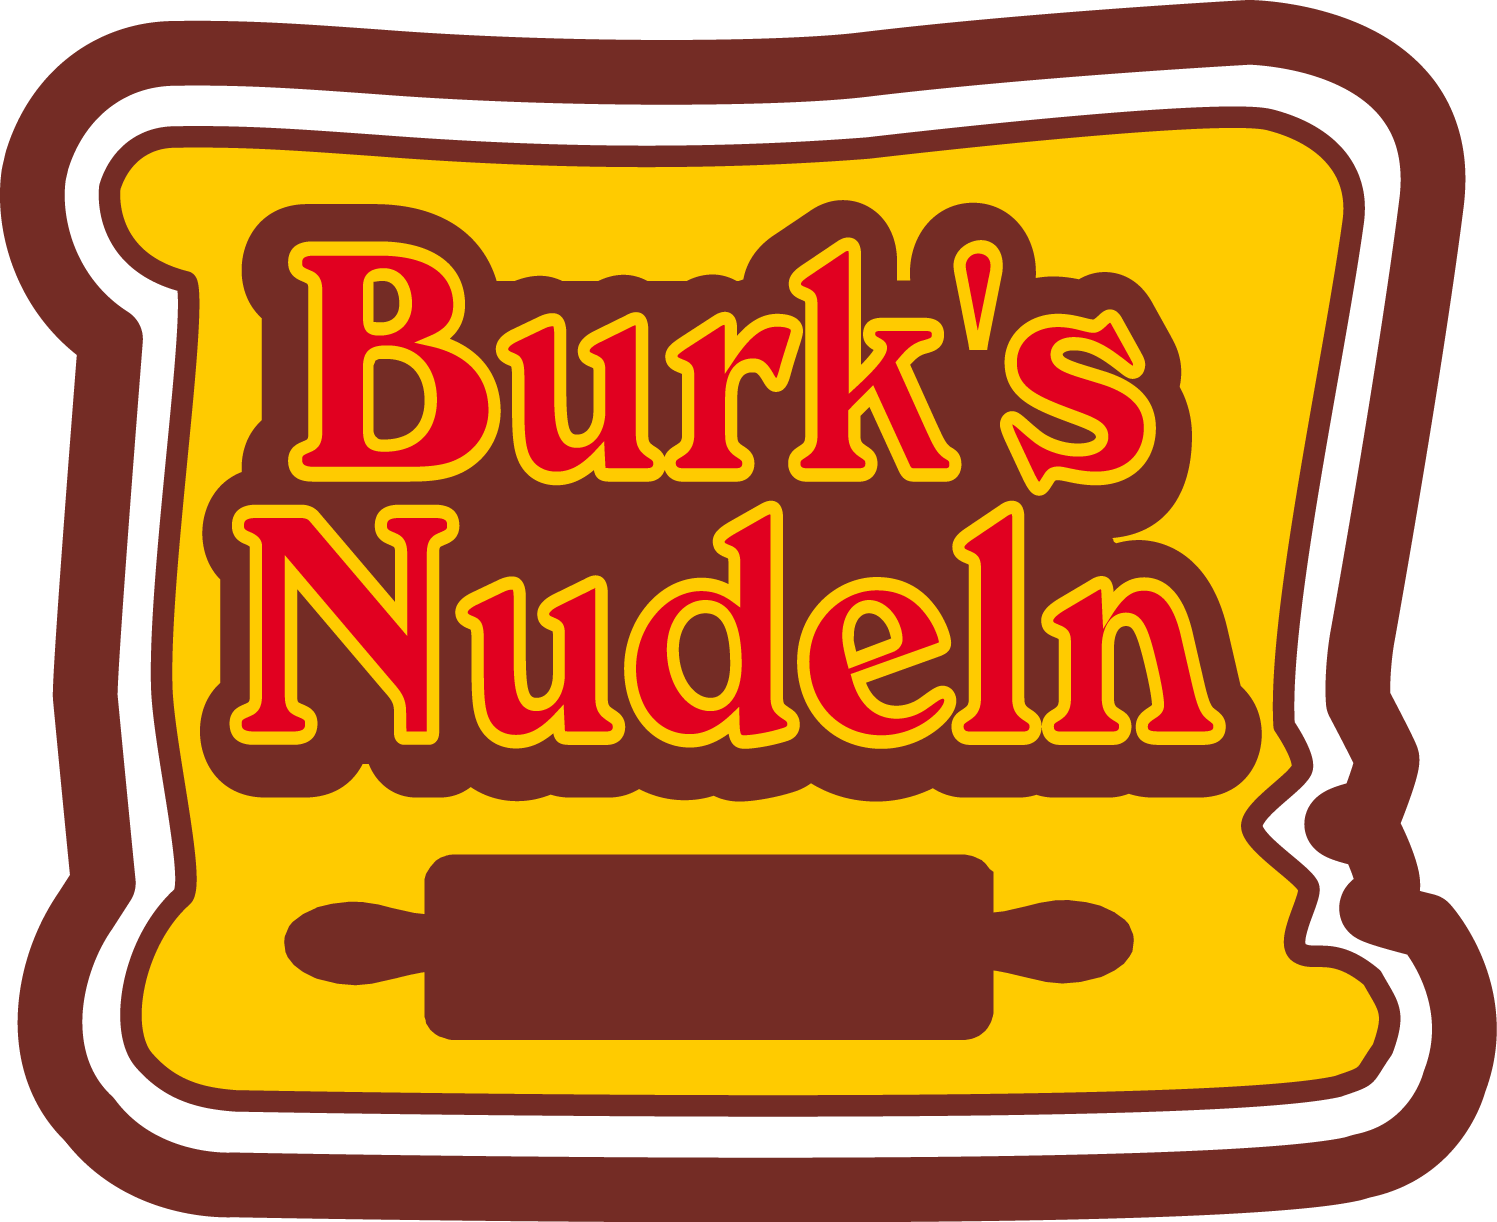 burks-nudeln